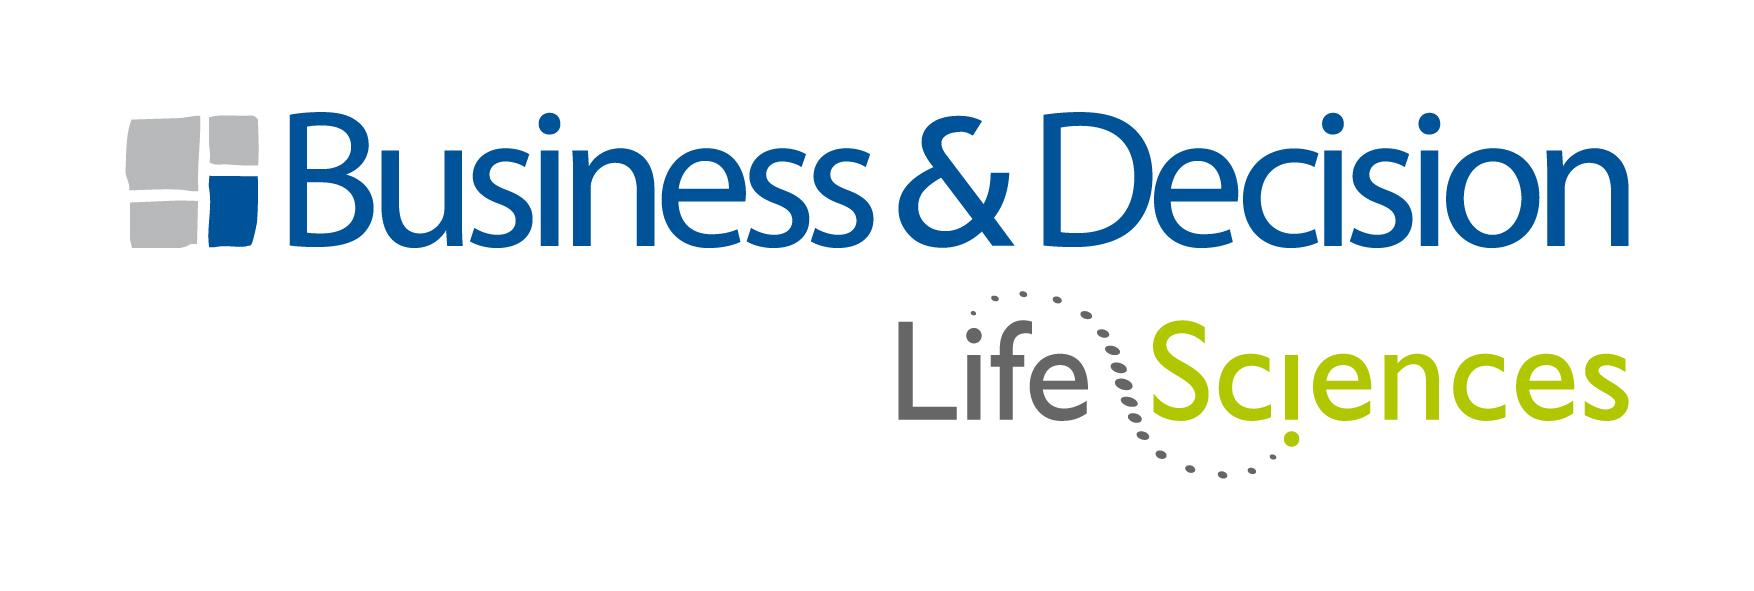 business_decision_logo